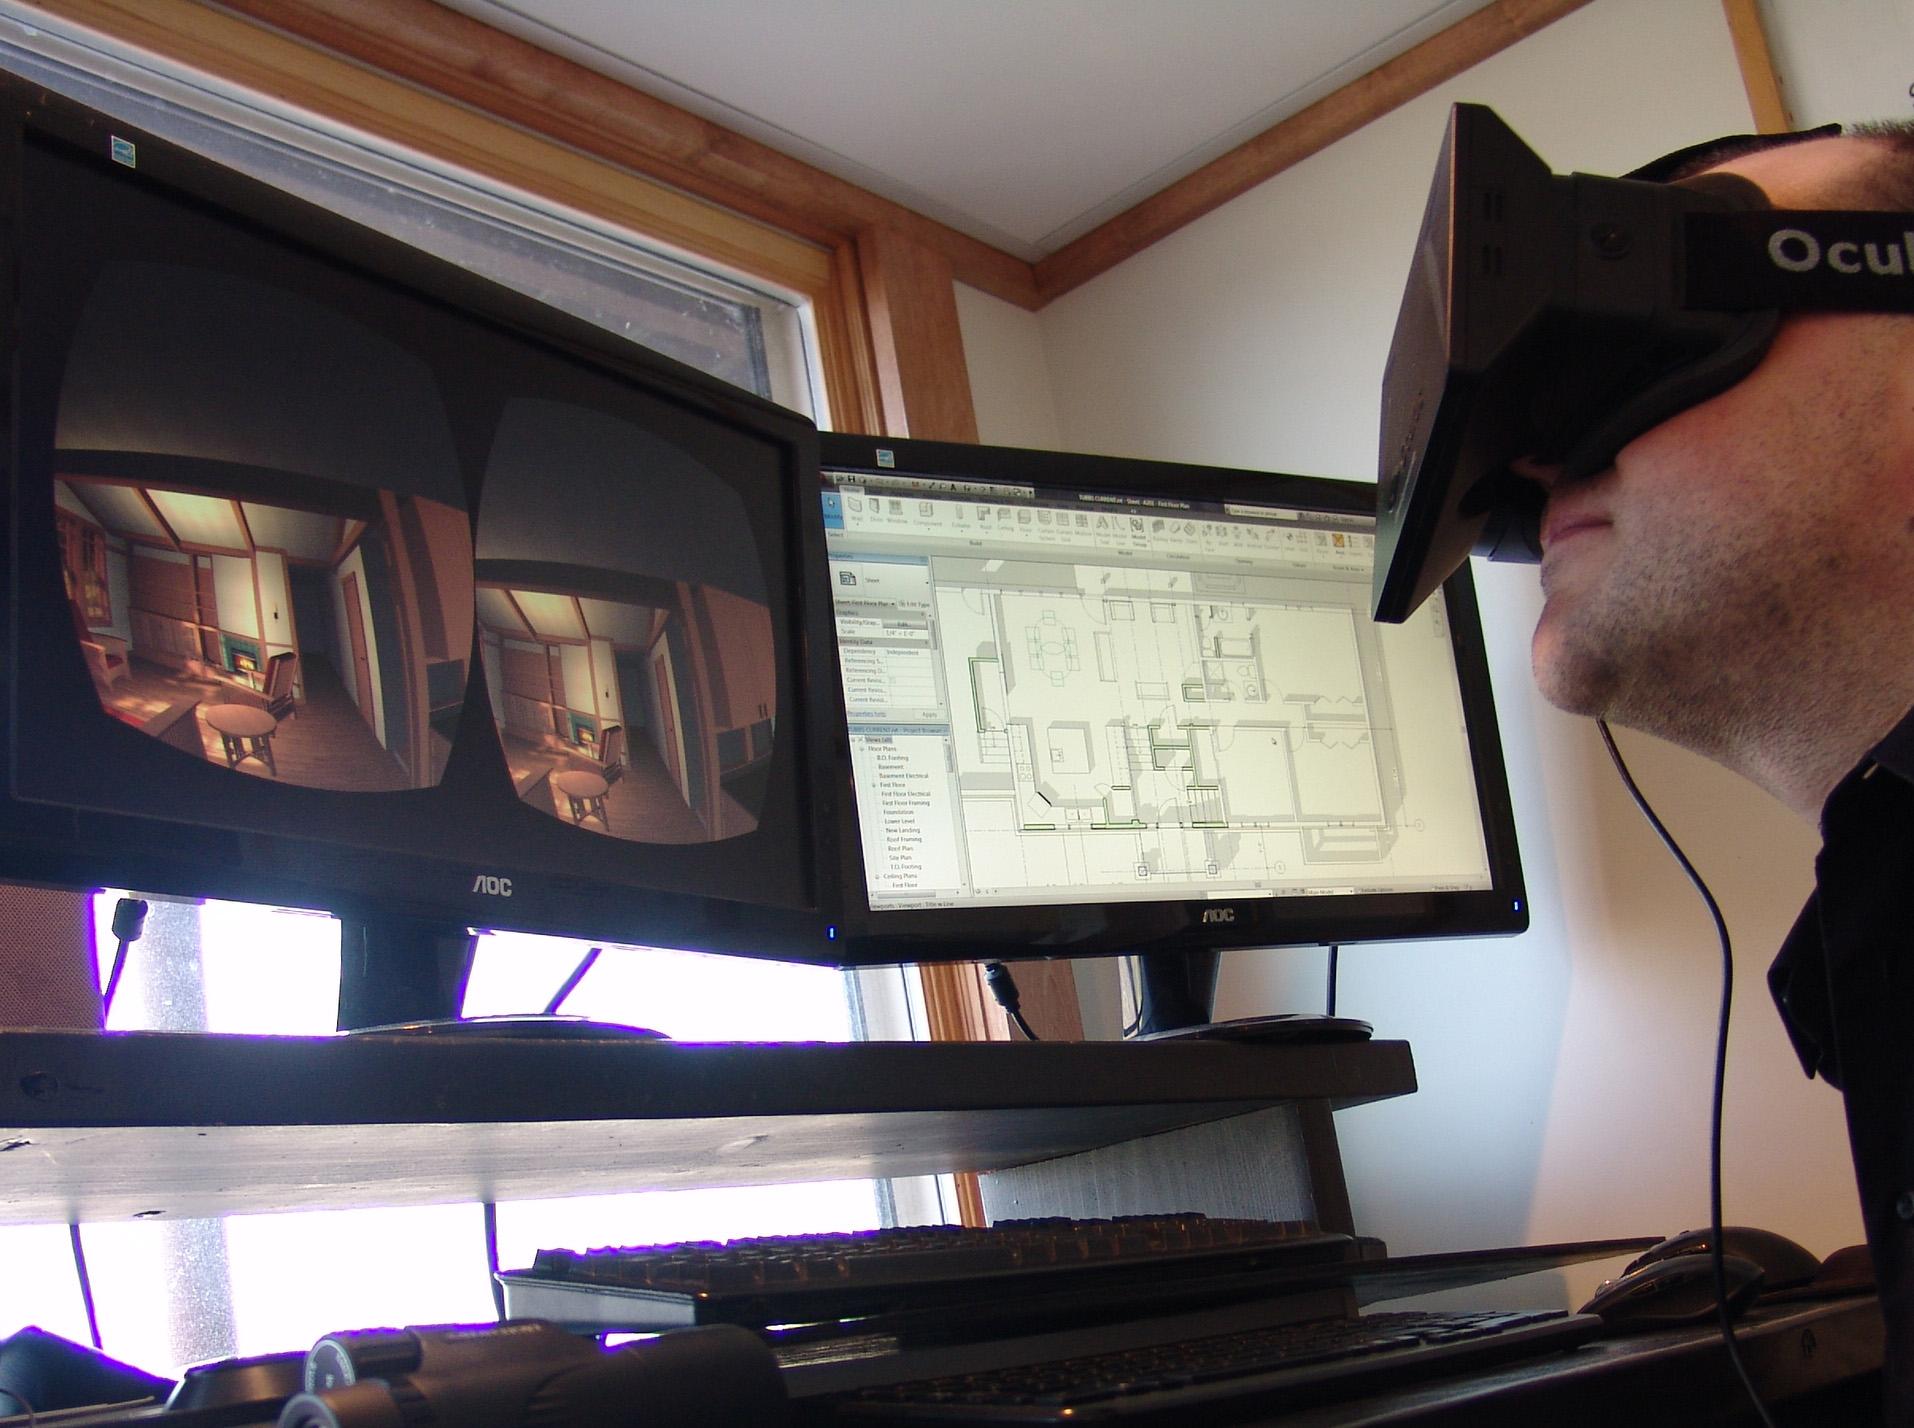 Revit And Oculus Rift Via Unity3d Experiencing Bim In